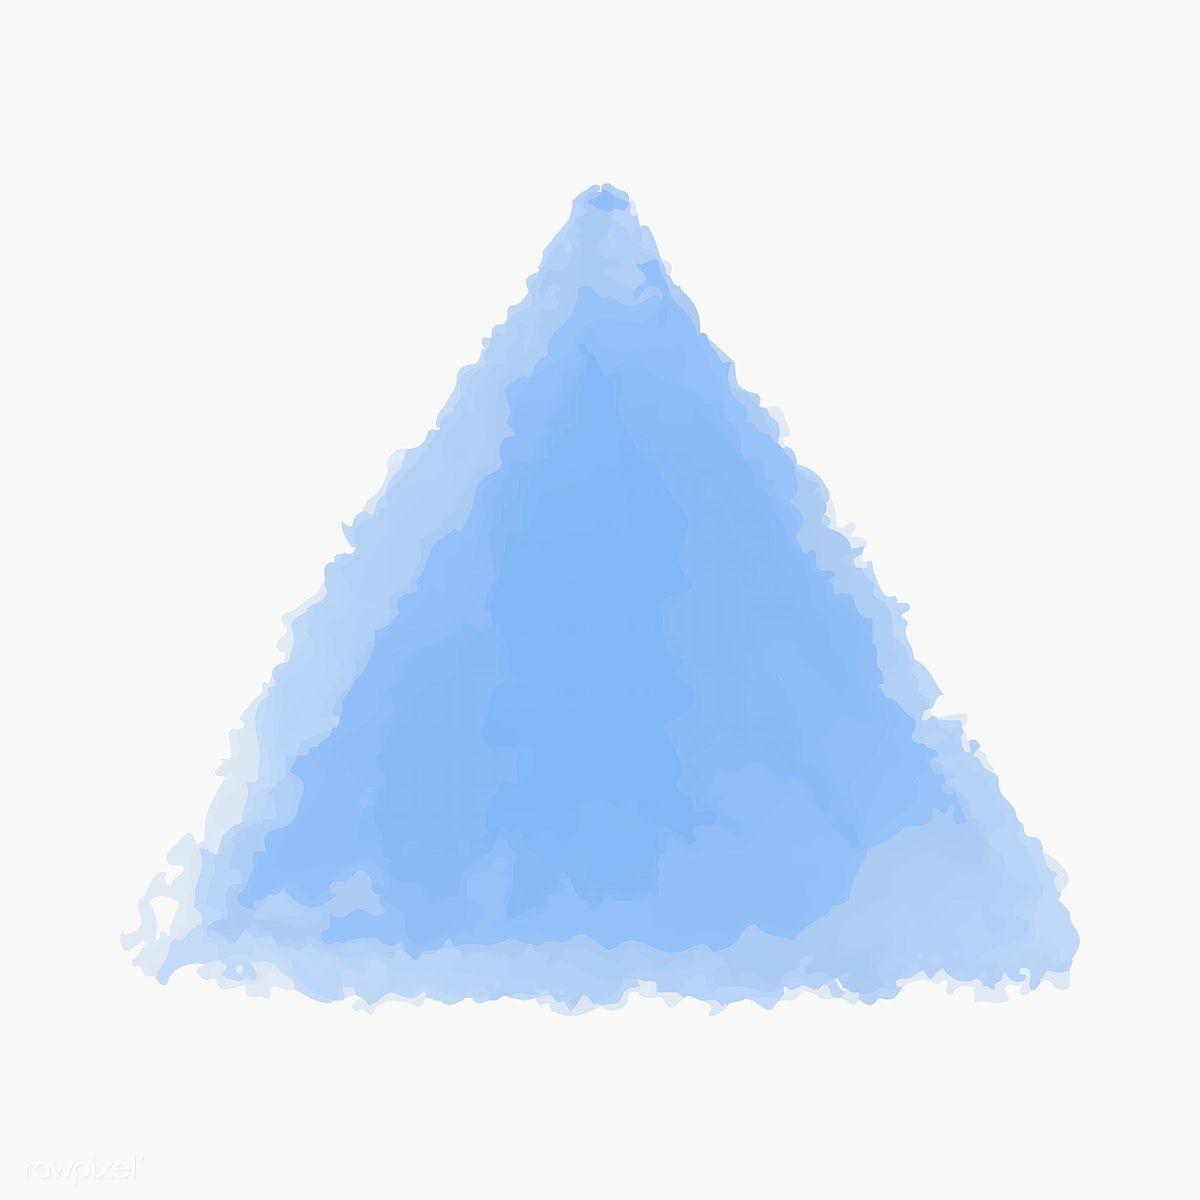 Blue Watercolor Geometric Shape Transparent Png Free Image By Rawpixel Com Ningzk V Geometric Shapes Blue Watercolor Geometric